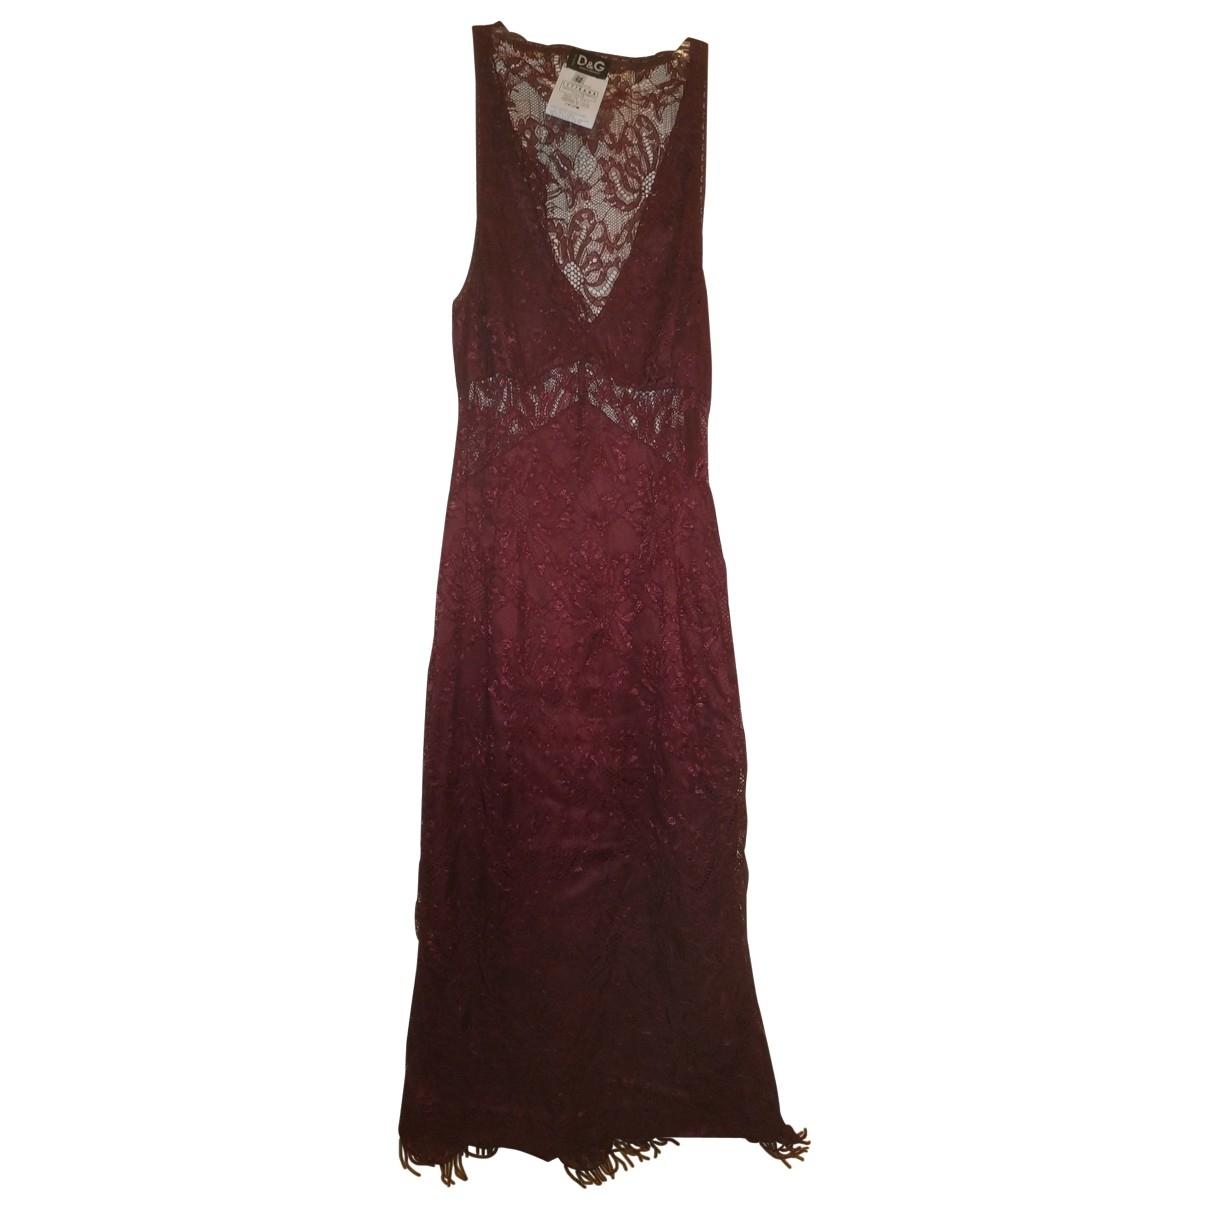 D&g \N Burgundy Lace dress for Women 38 IT